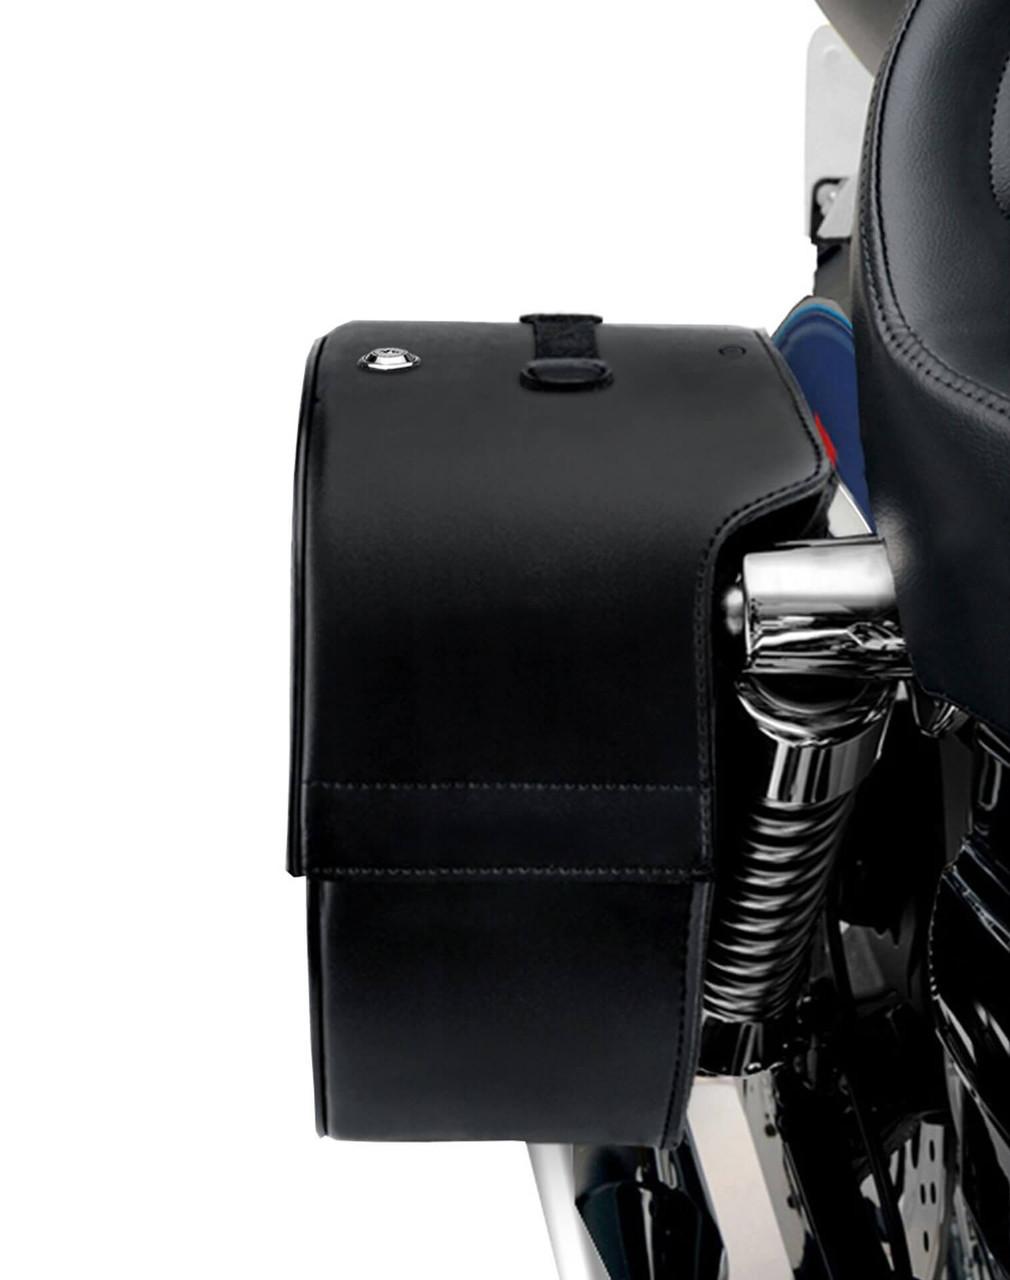 Kawasaki 1600 Mean Streak Spear Large Motorcycle Saddlebags Shock Cutout View